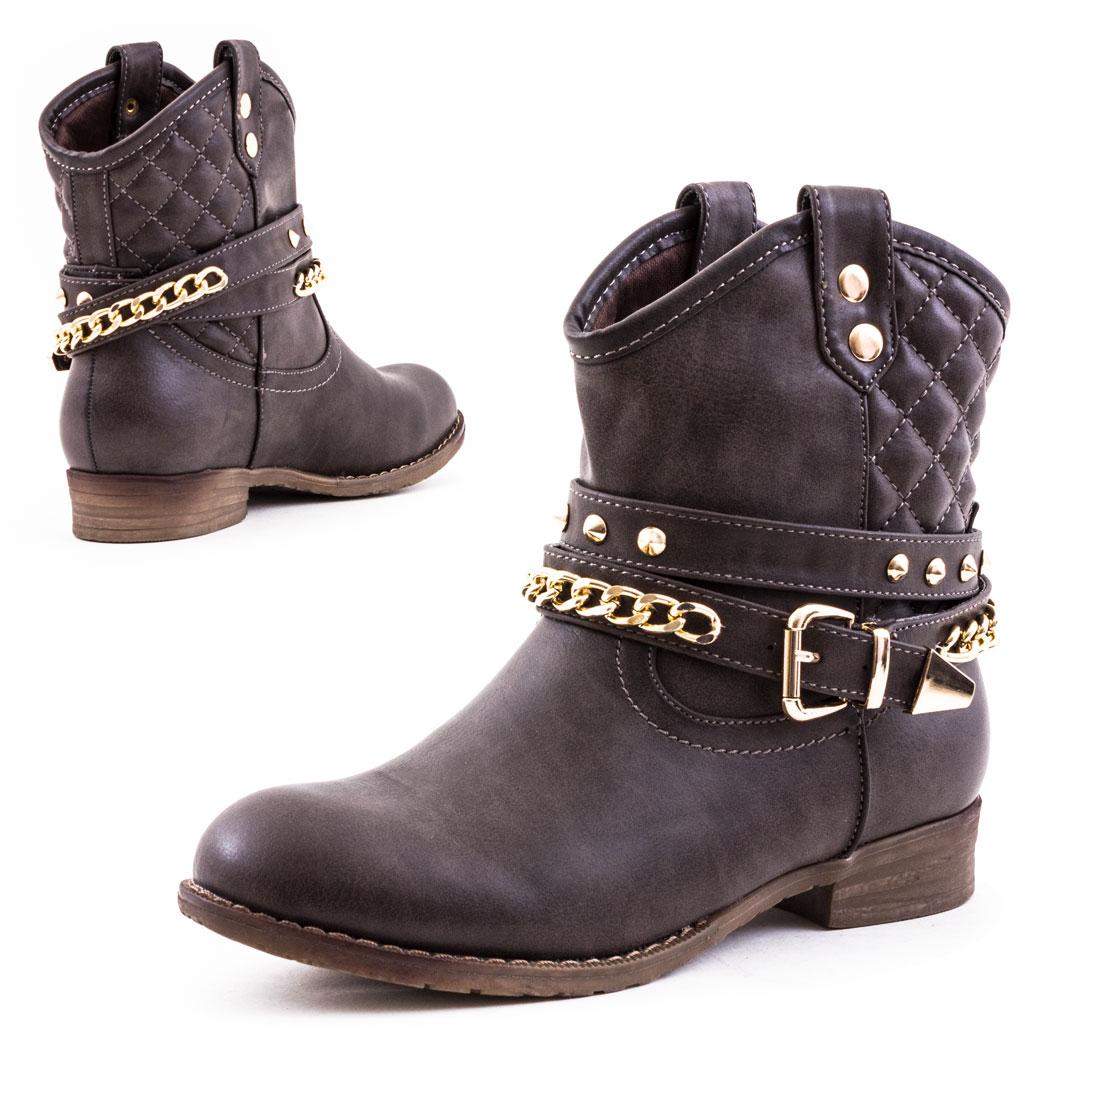 neu damen western cowboy stiefel nieten boots schuhe gr 36 37 38 39 40 41 ebay. Black Bedroom Furniture Sets. Home Design Ideas